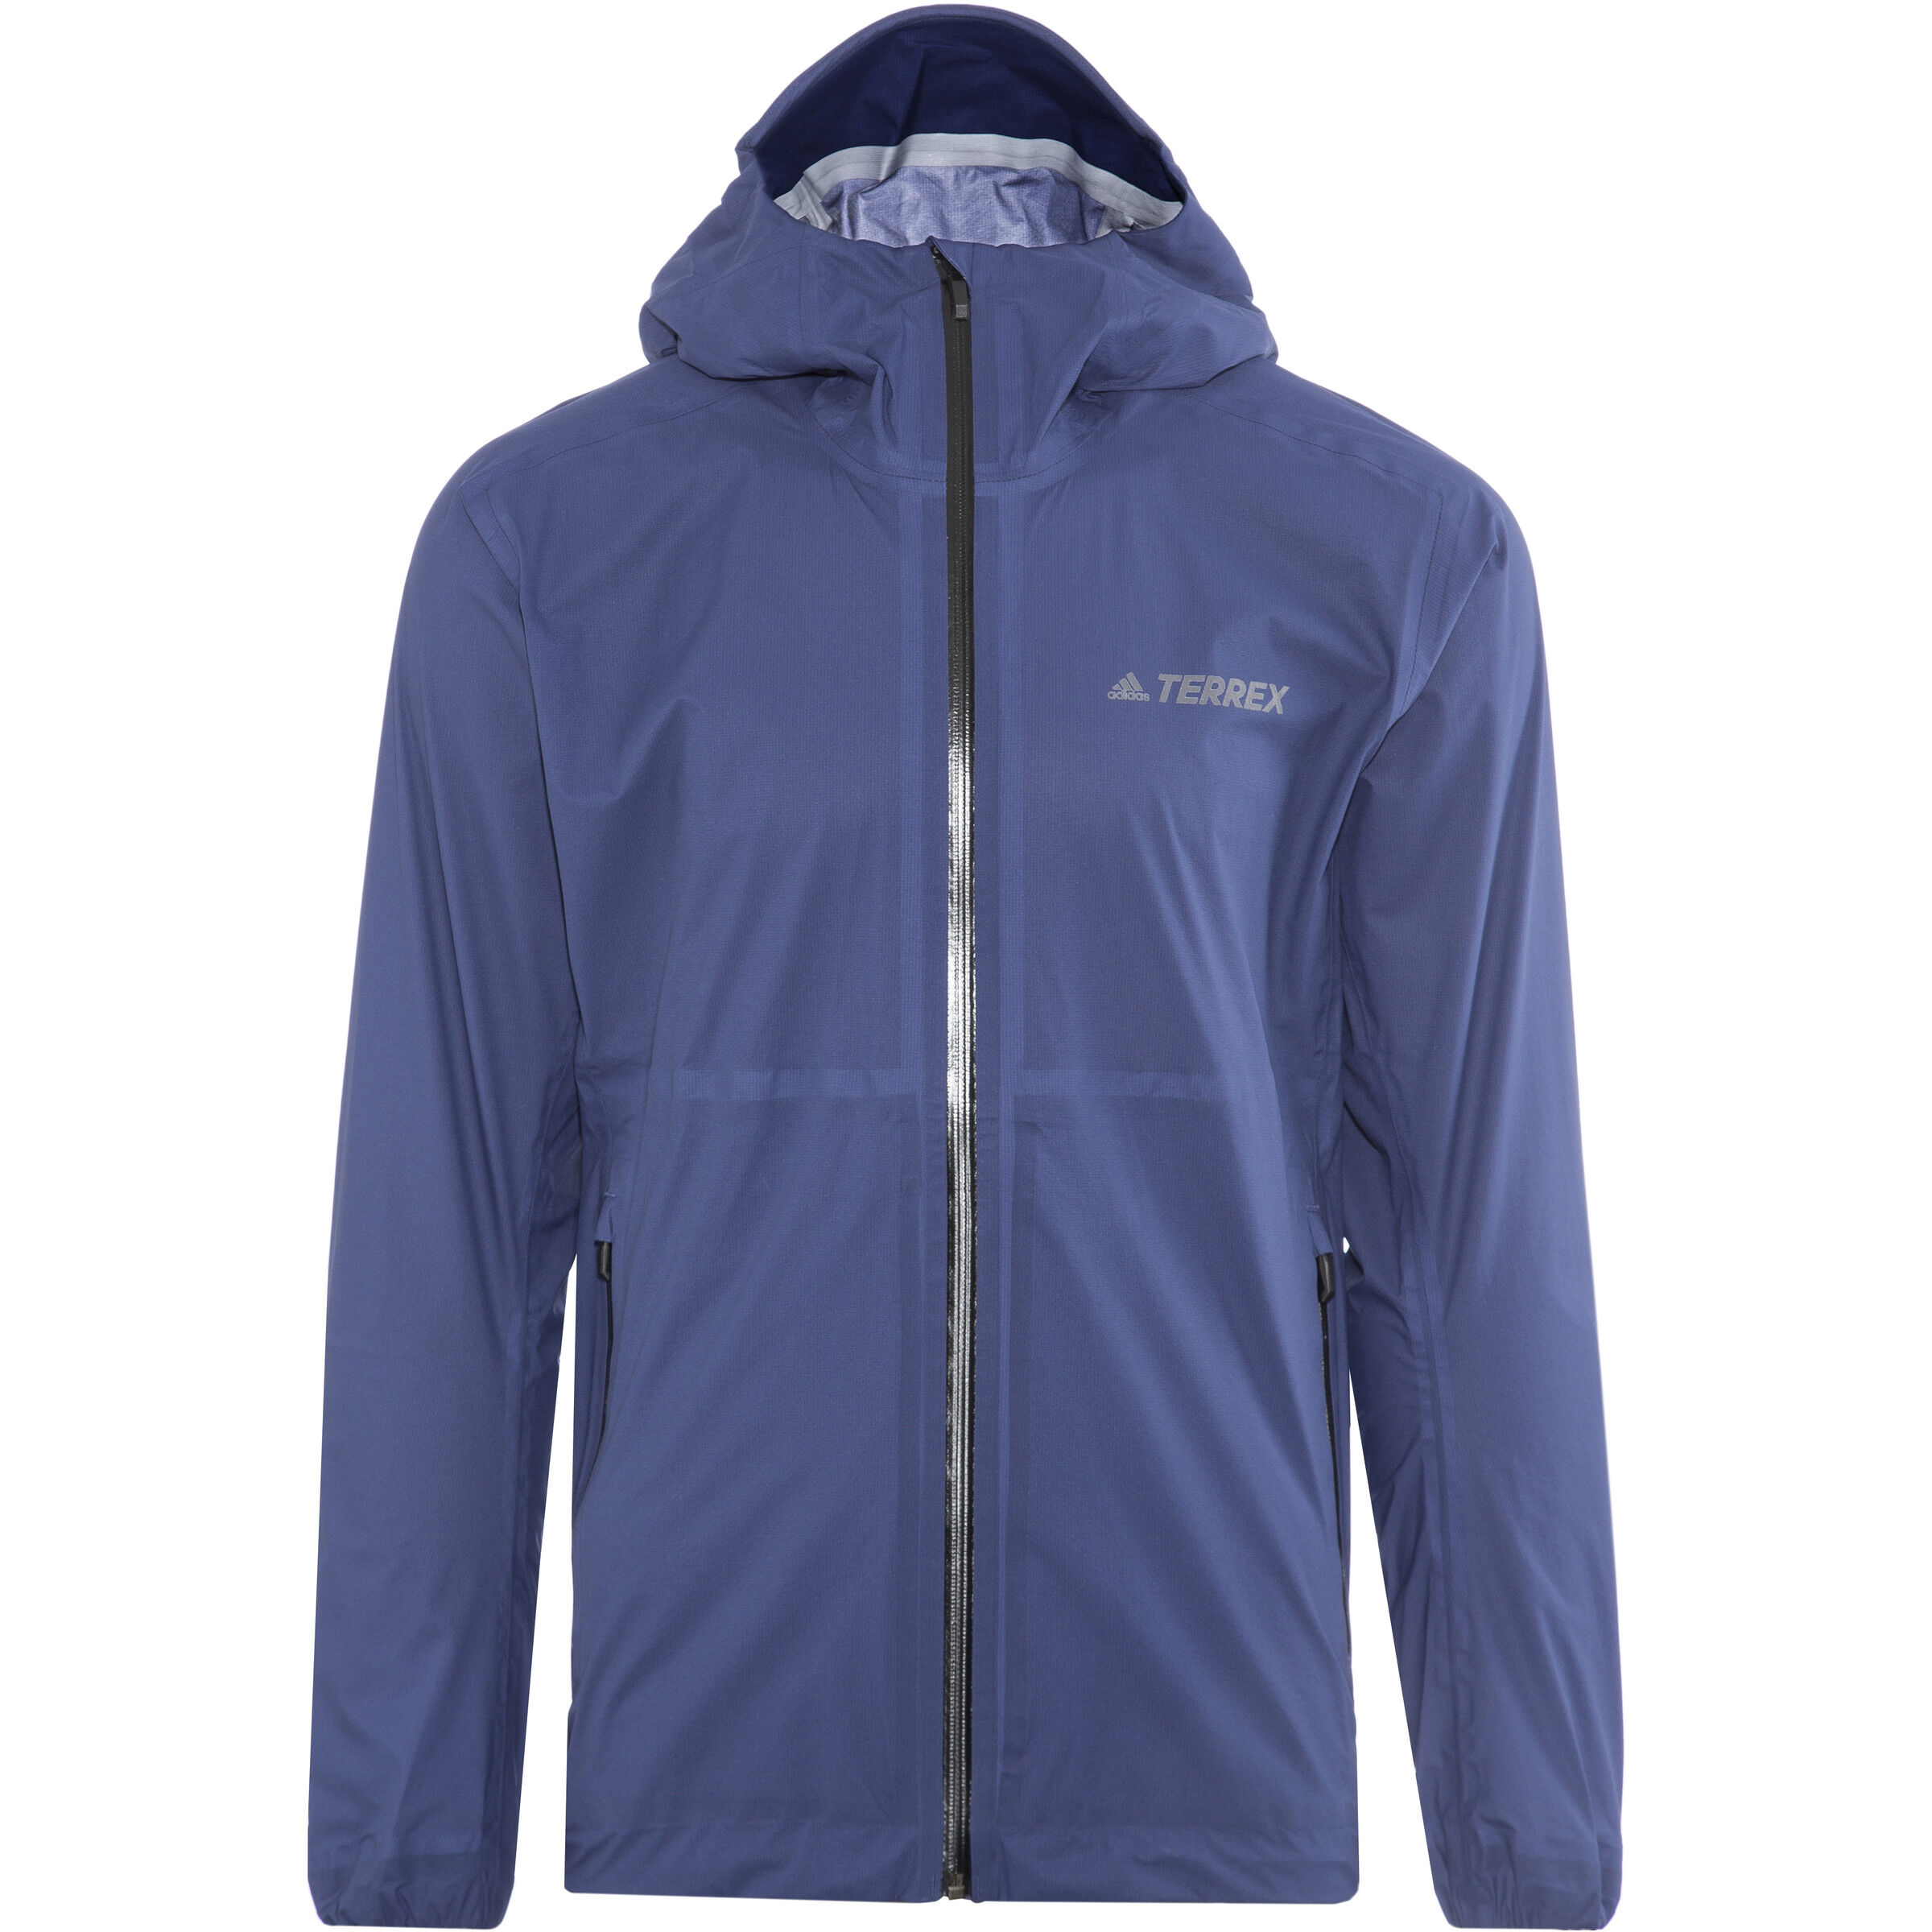 Agravic Jacket Noble Adidas Indigo Herren Terrex 3l GUpqSzMV